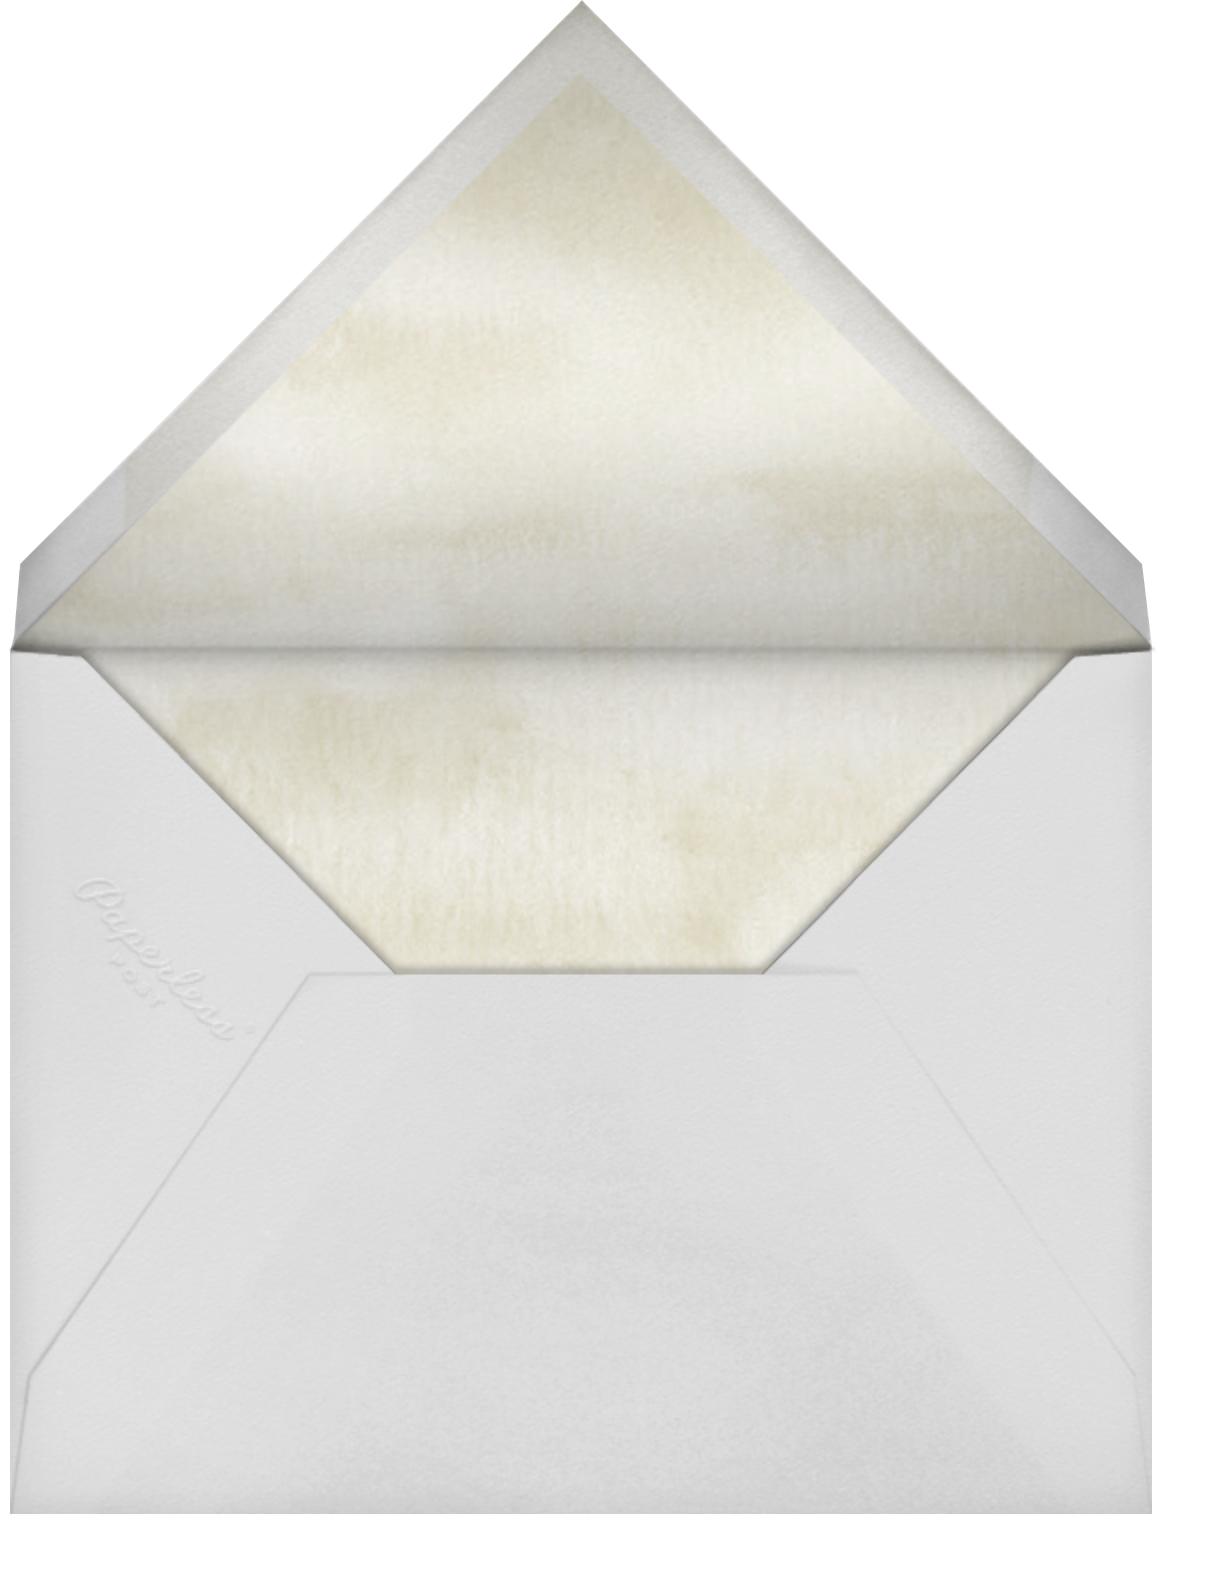 Muguet - Felix Doolittle - Thank you - envelope back